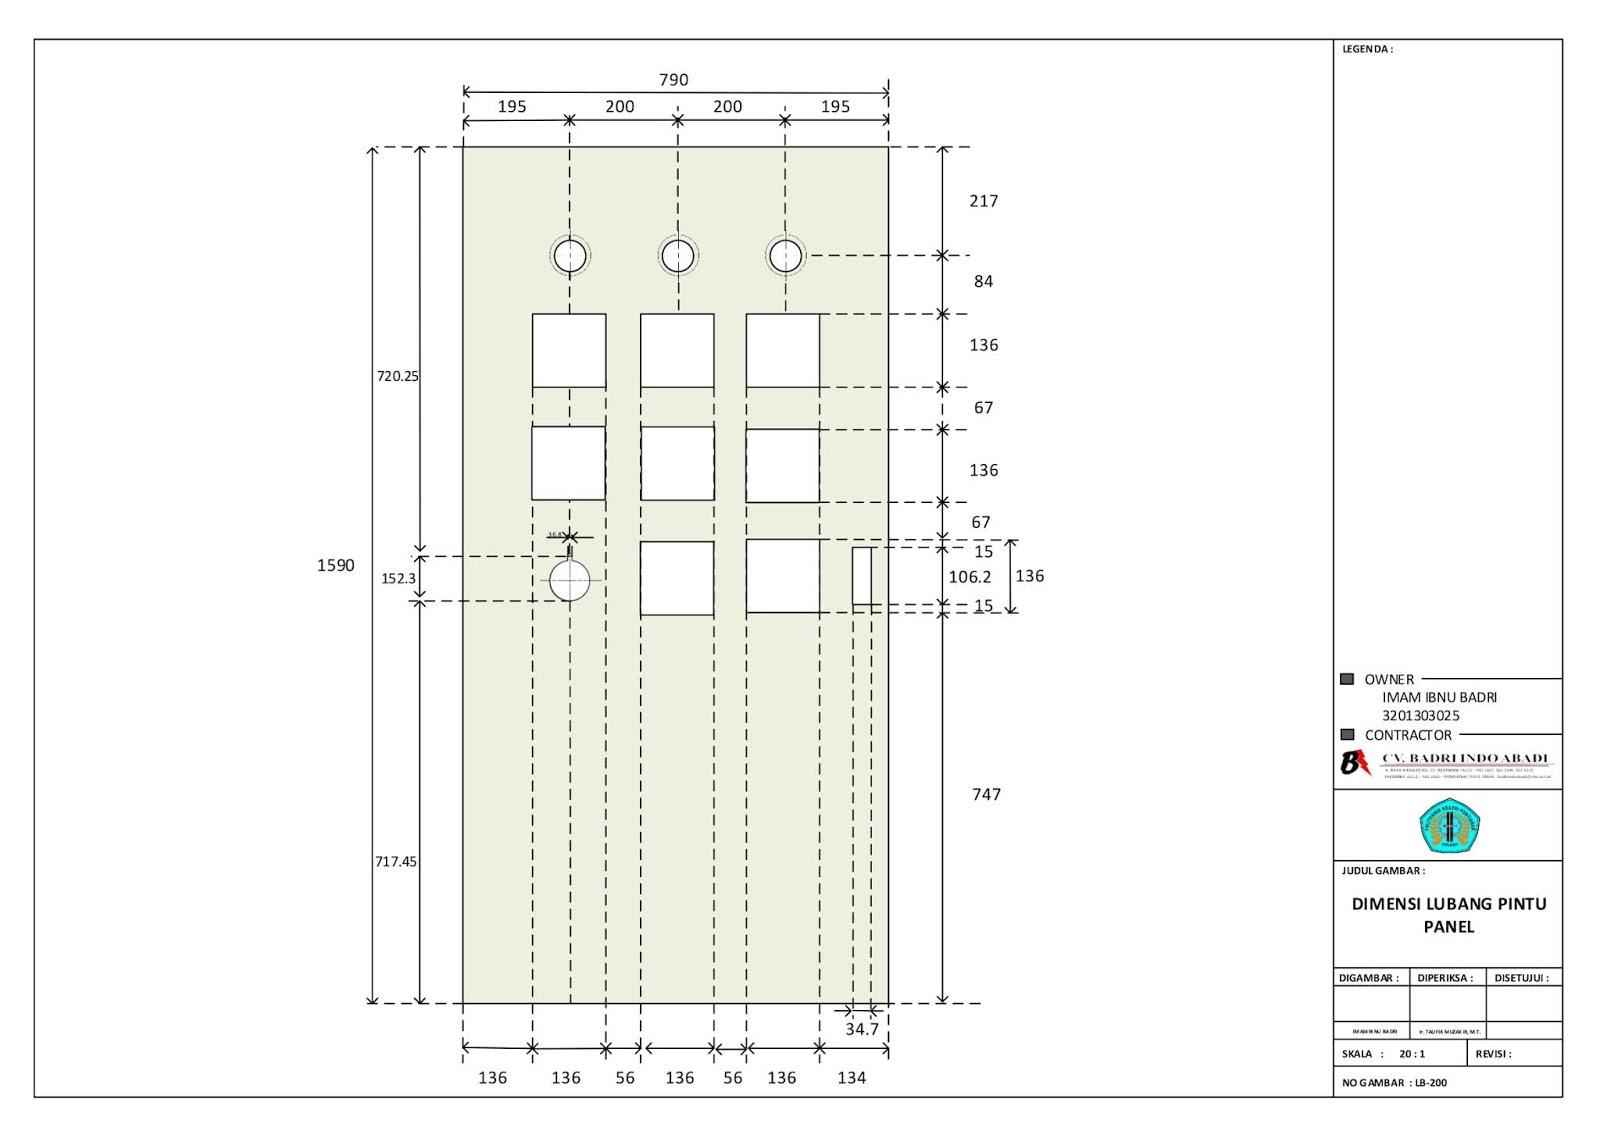 Dimensi Lubang Pintu Panel